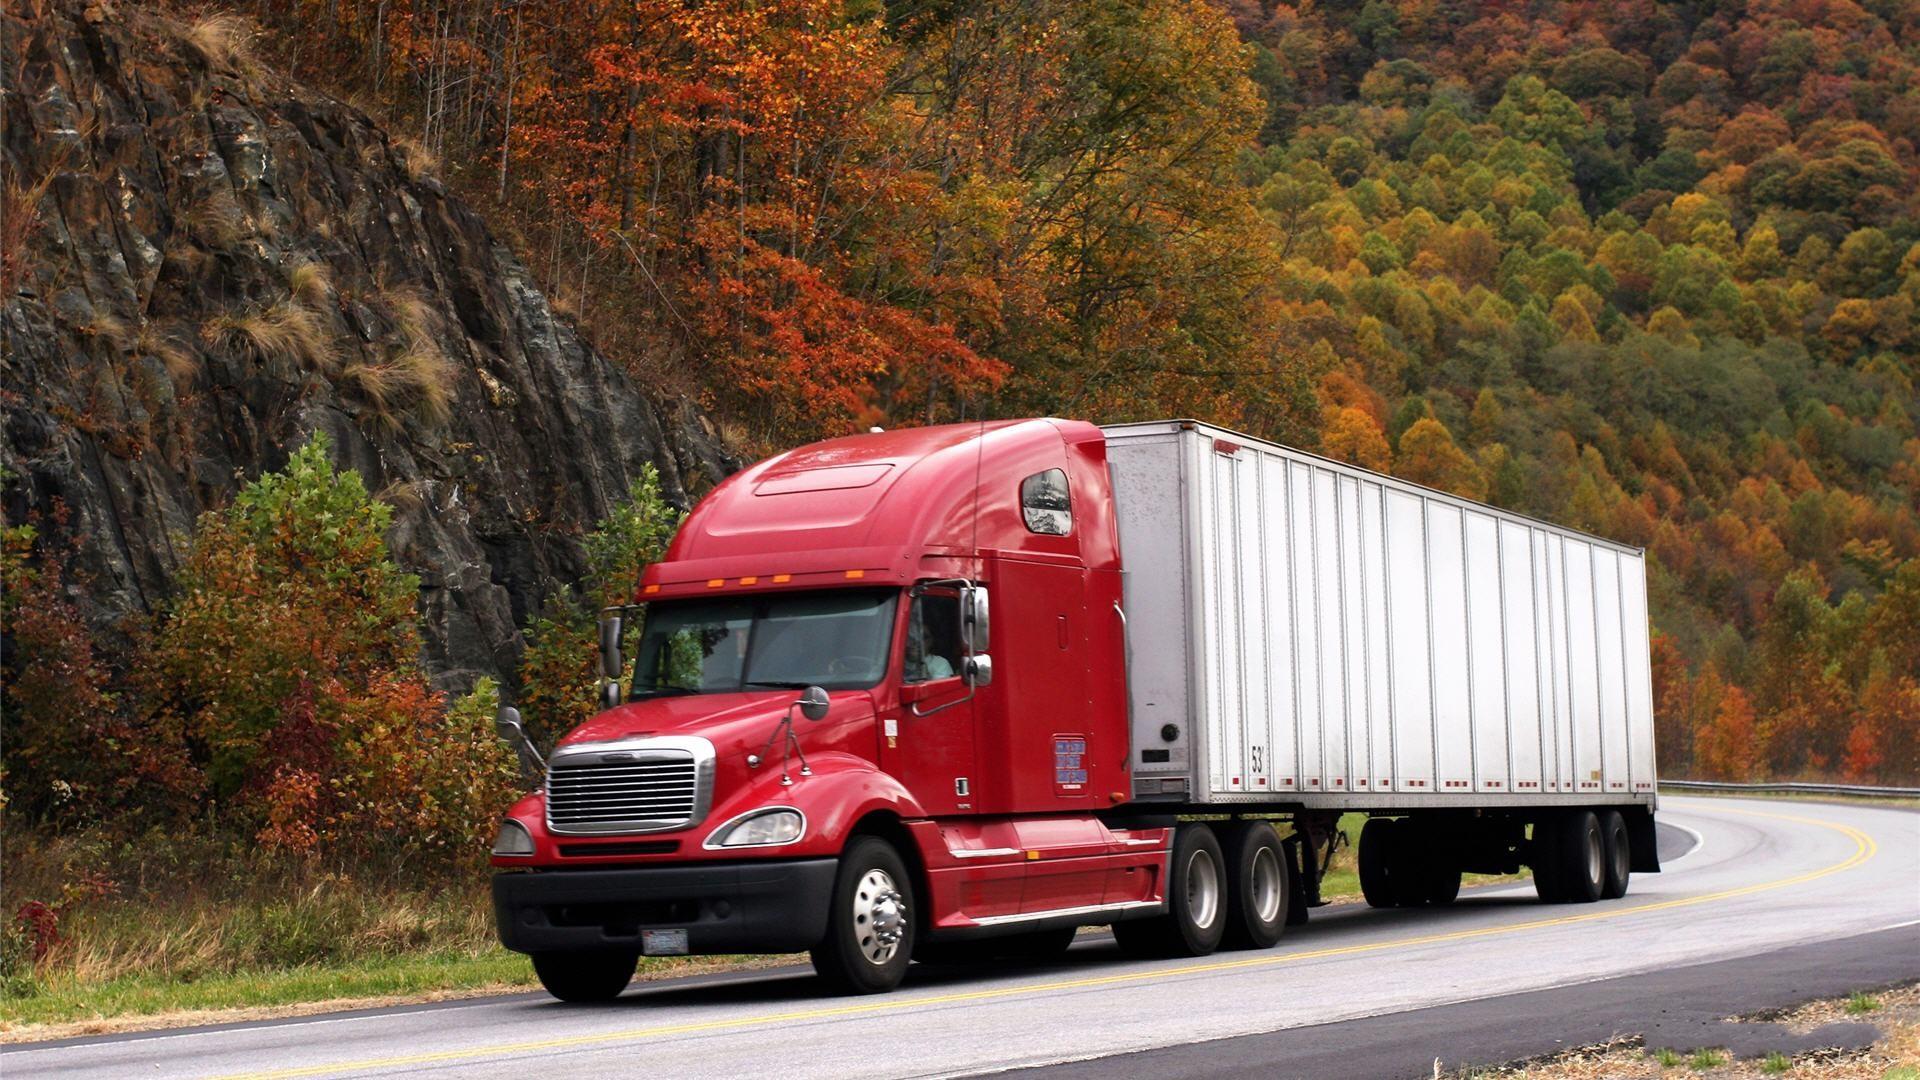 Free Download Semi Truck Wallpapers